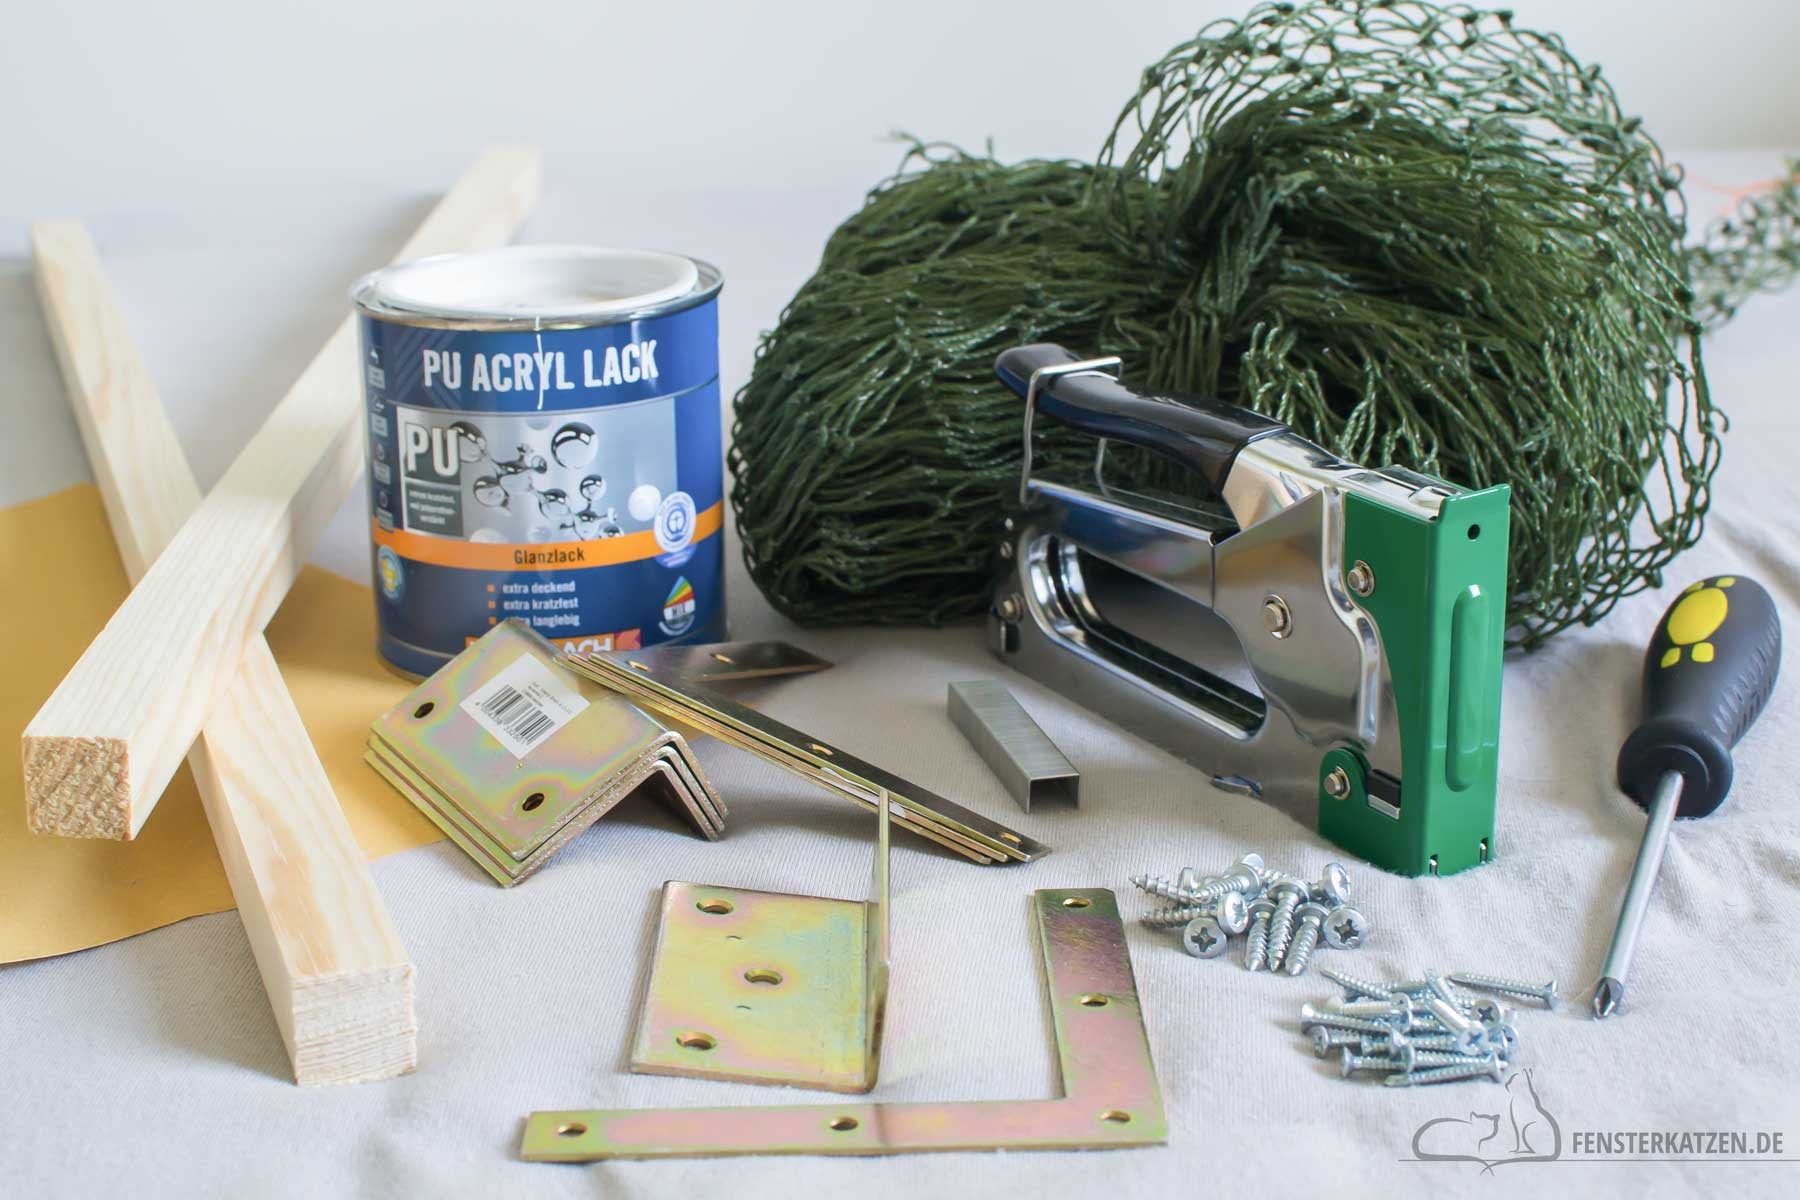 Fensterkatzen-DIY-Do-It-Yourself-Fenstersicherung-Katzen-ohne-bohren-Materialien